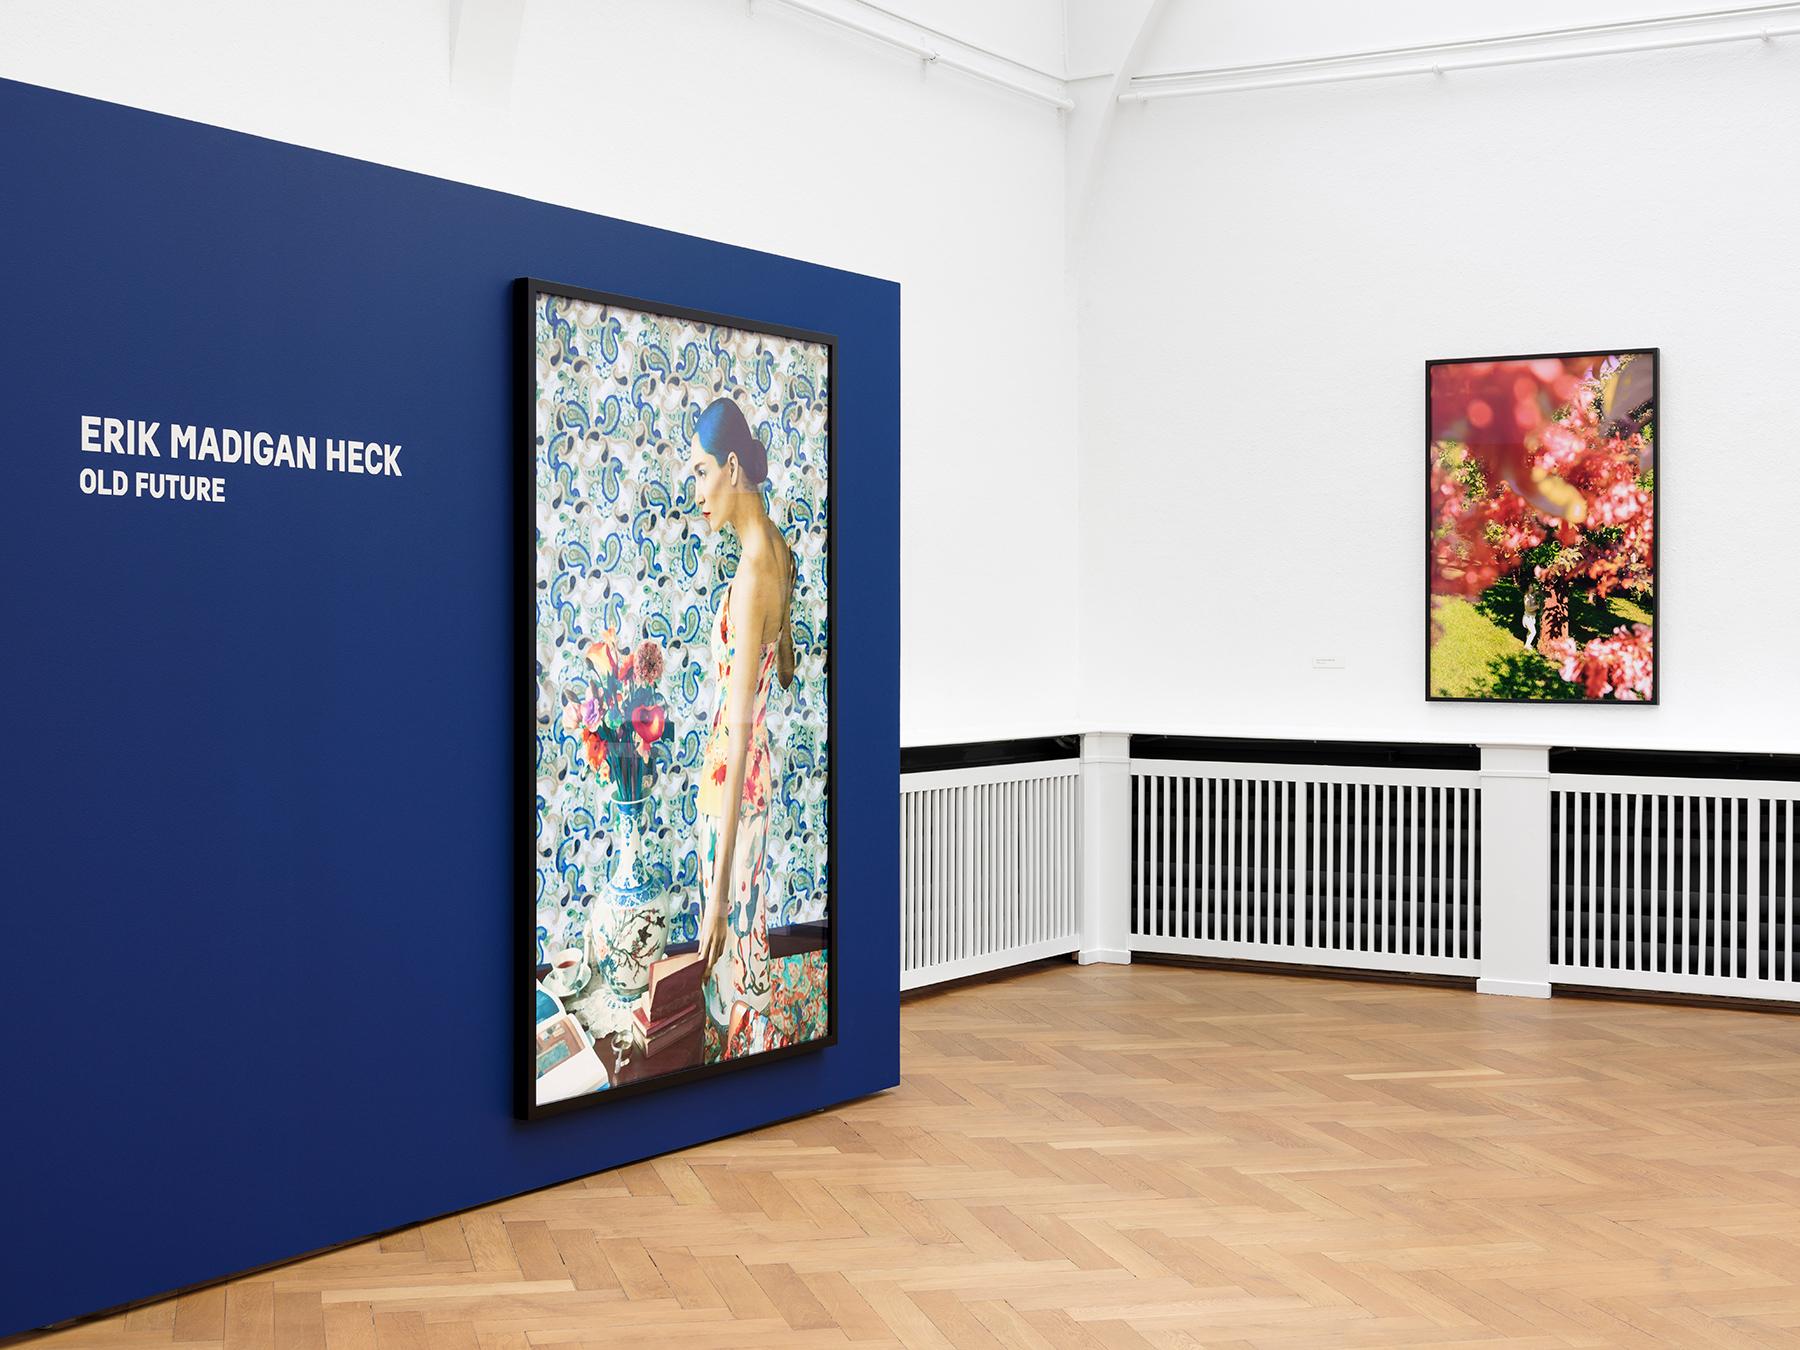 Erik-Madigan-Heck-musee-beaux-arts-locle-neuchatel-8750.jpg